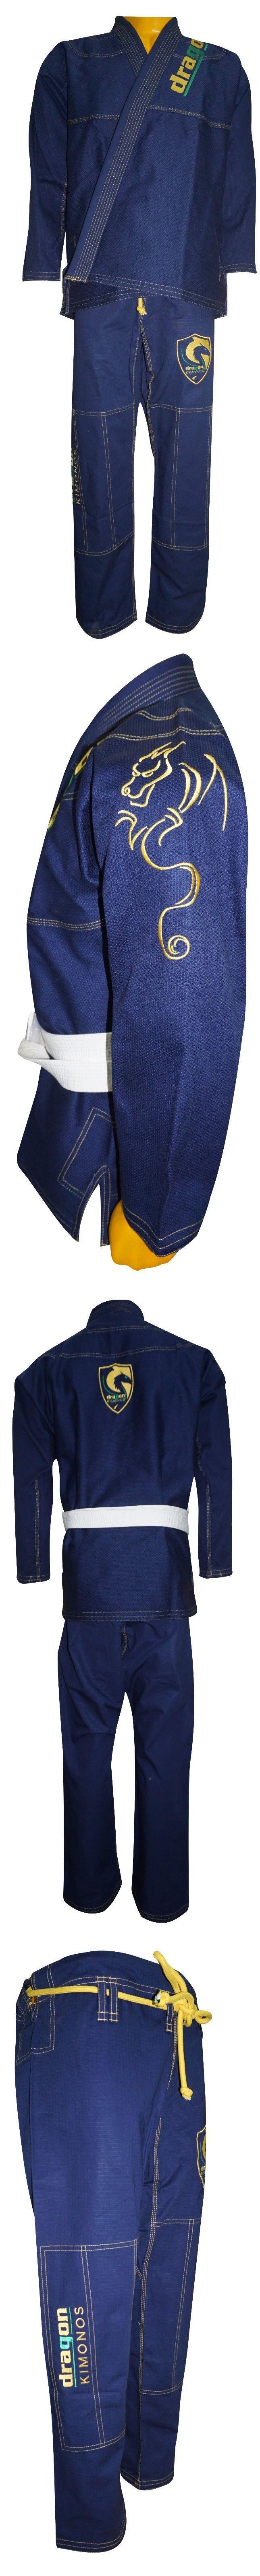 Uniforms and Gis 179774: Dragon Bjj Gi Mma Grappling Kimono Jiu Jitsu Gi Mix Martial Arts Suit Free Belt -> BUY IT NOW ONLY: $57.86 on eBay!